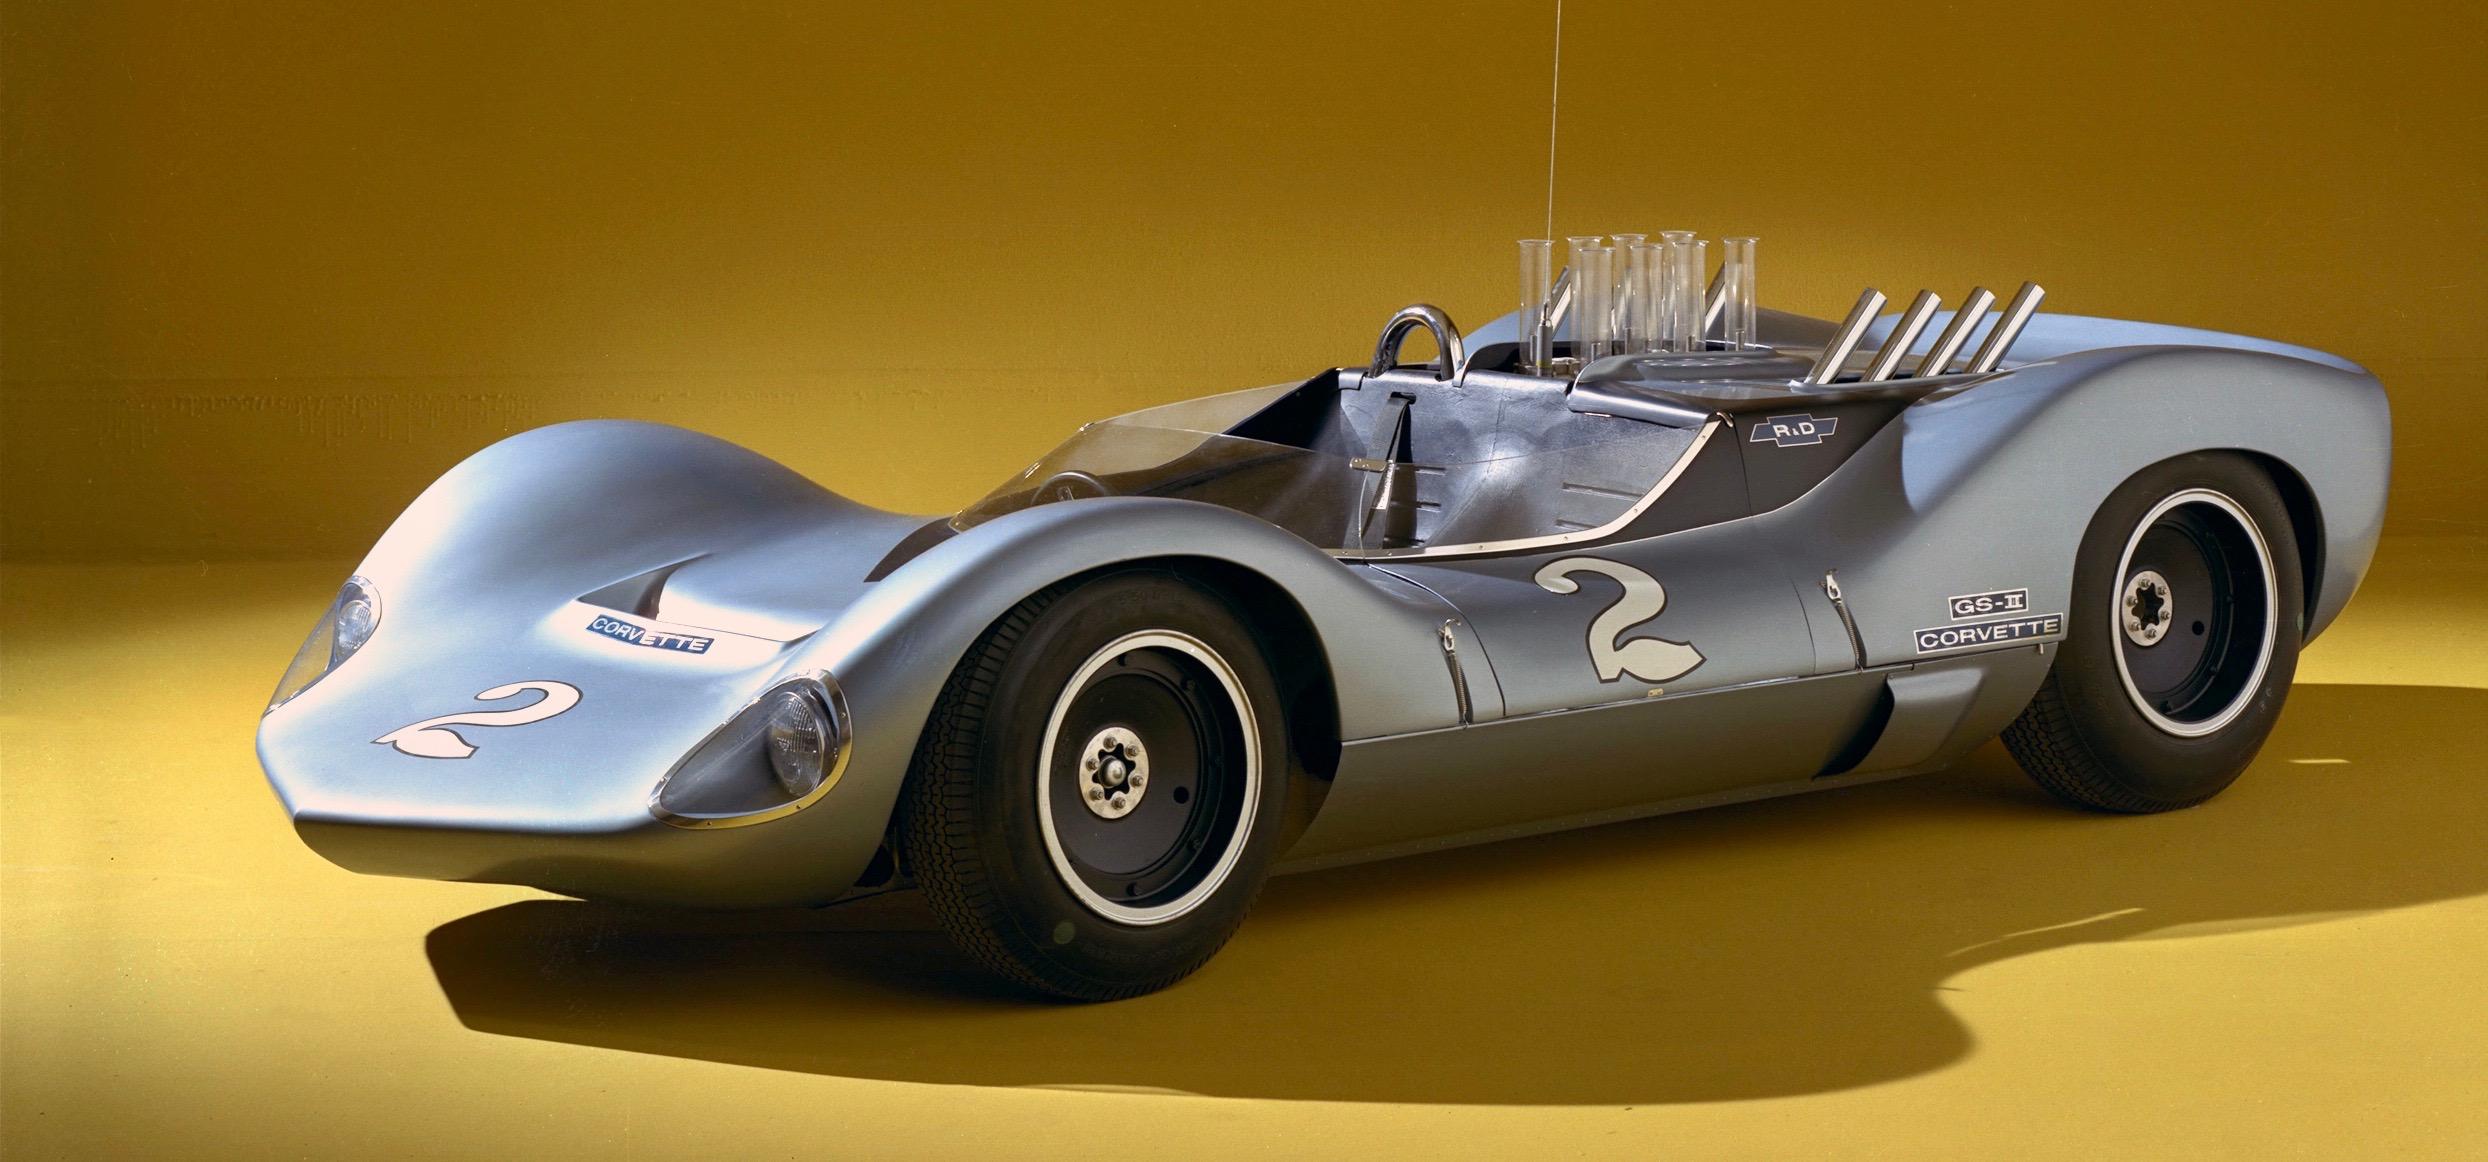 Mid-engine Corvette, Mid-engine Corvette, it is not a new idea, ClassicCars.com Journal